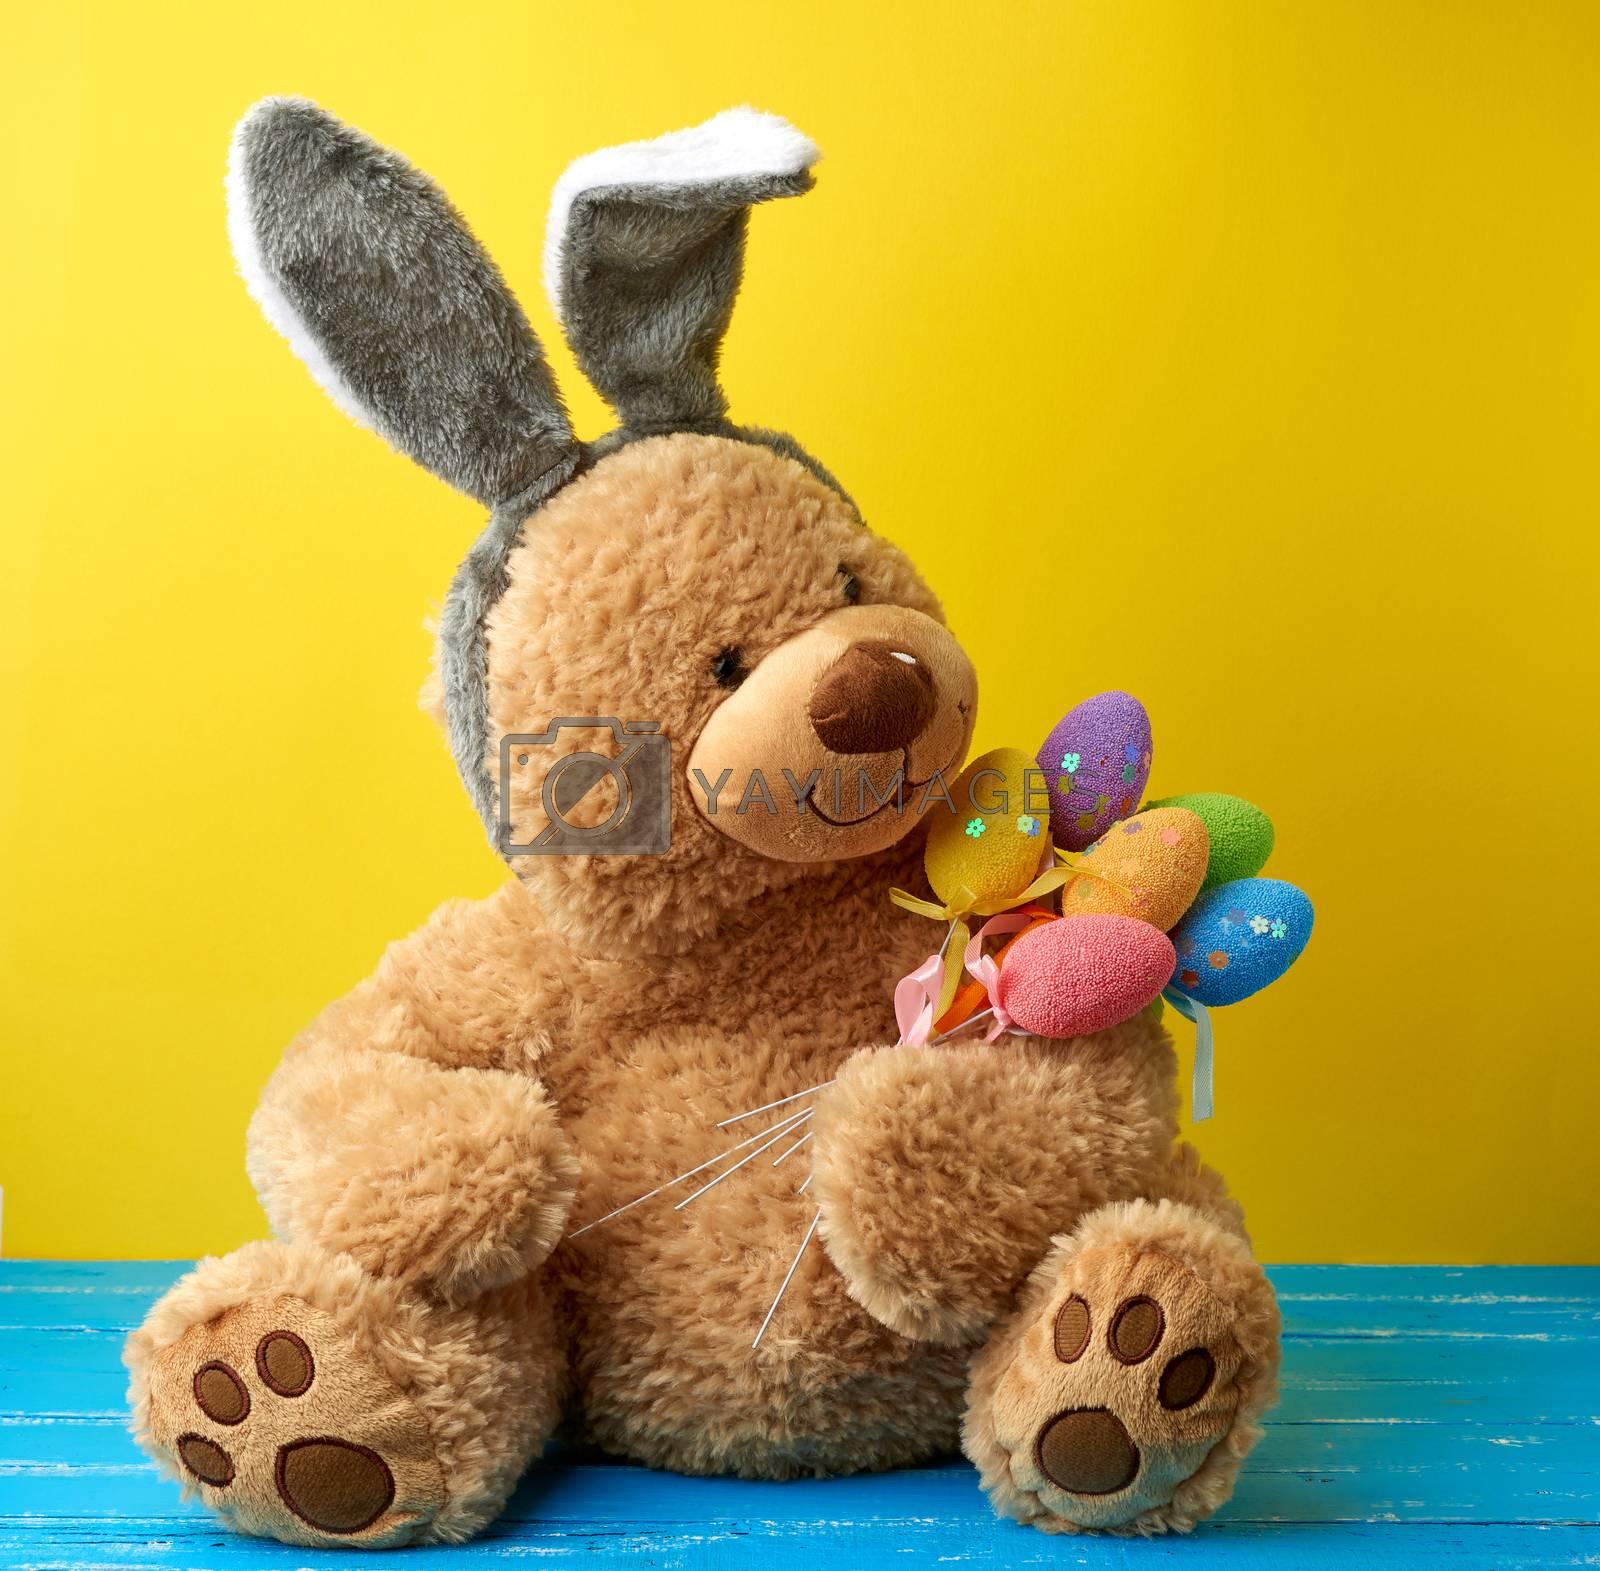 big cute brown teddy bear holding colorful Easter eggs, wearing  by ndanko